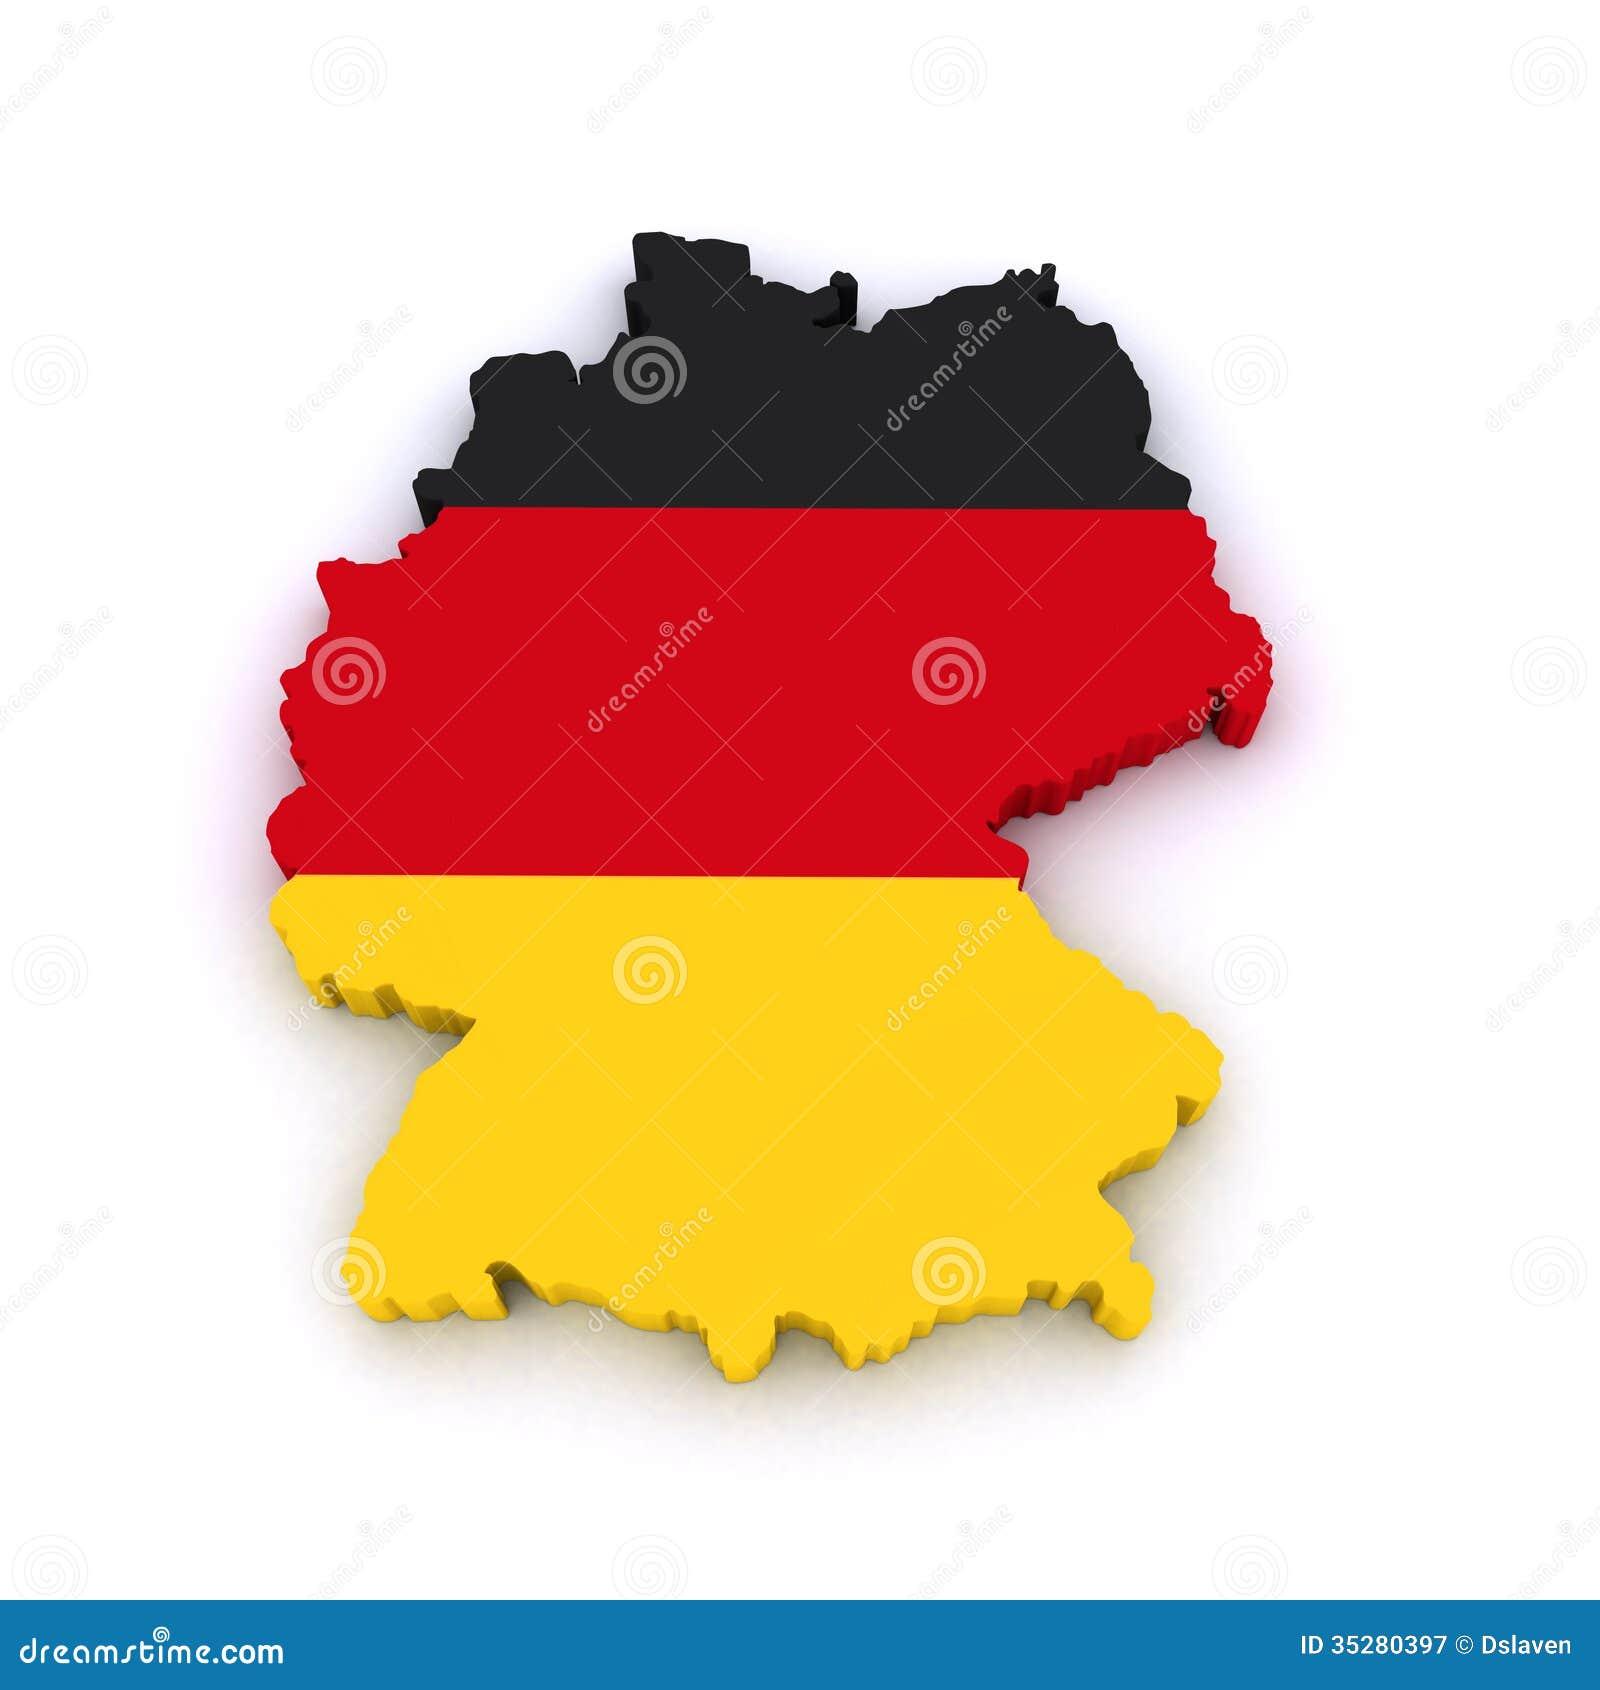 Map Of Germany 3d.Germany 3d Map Stock Illustration Illustration Of Deutschland